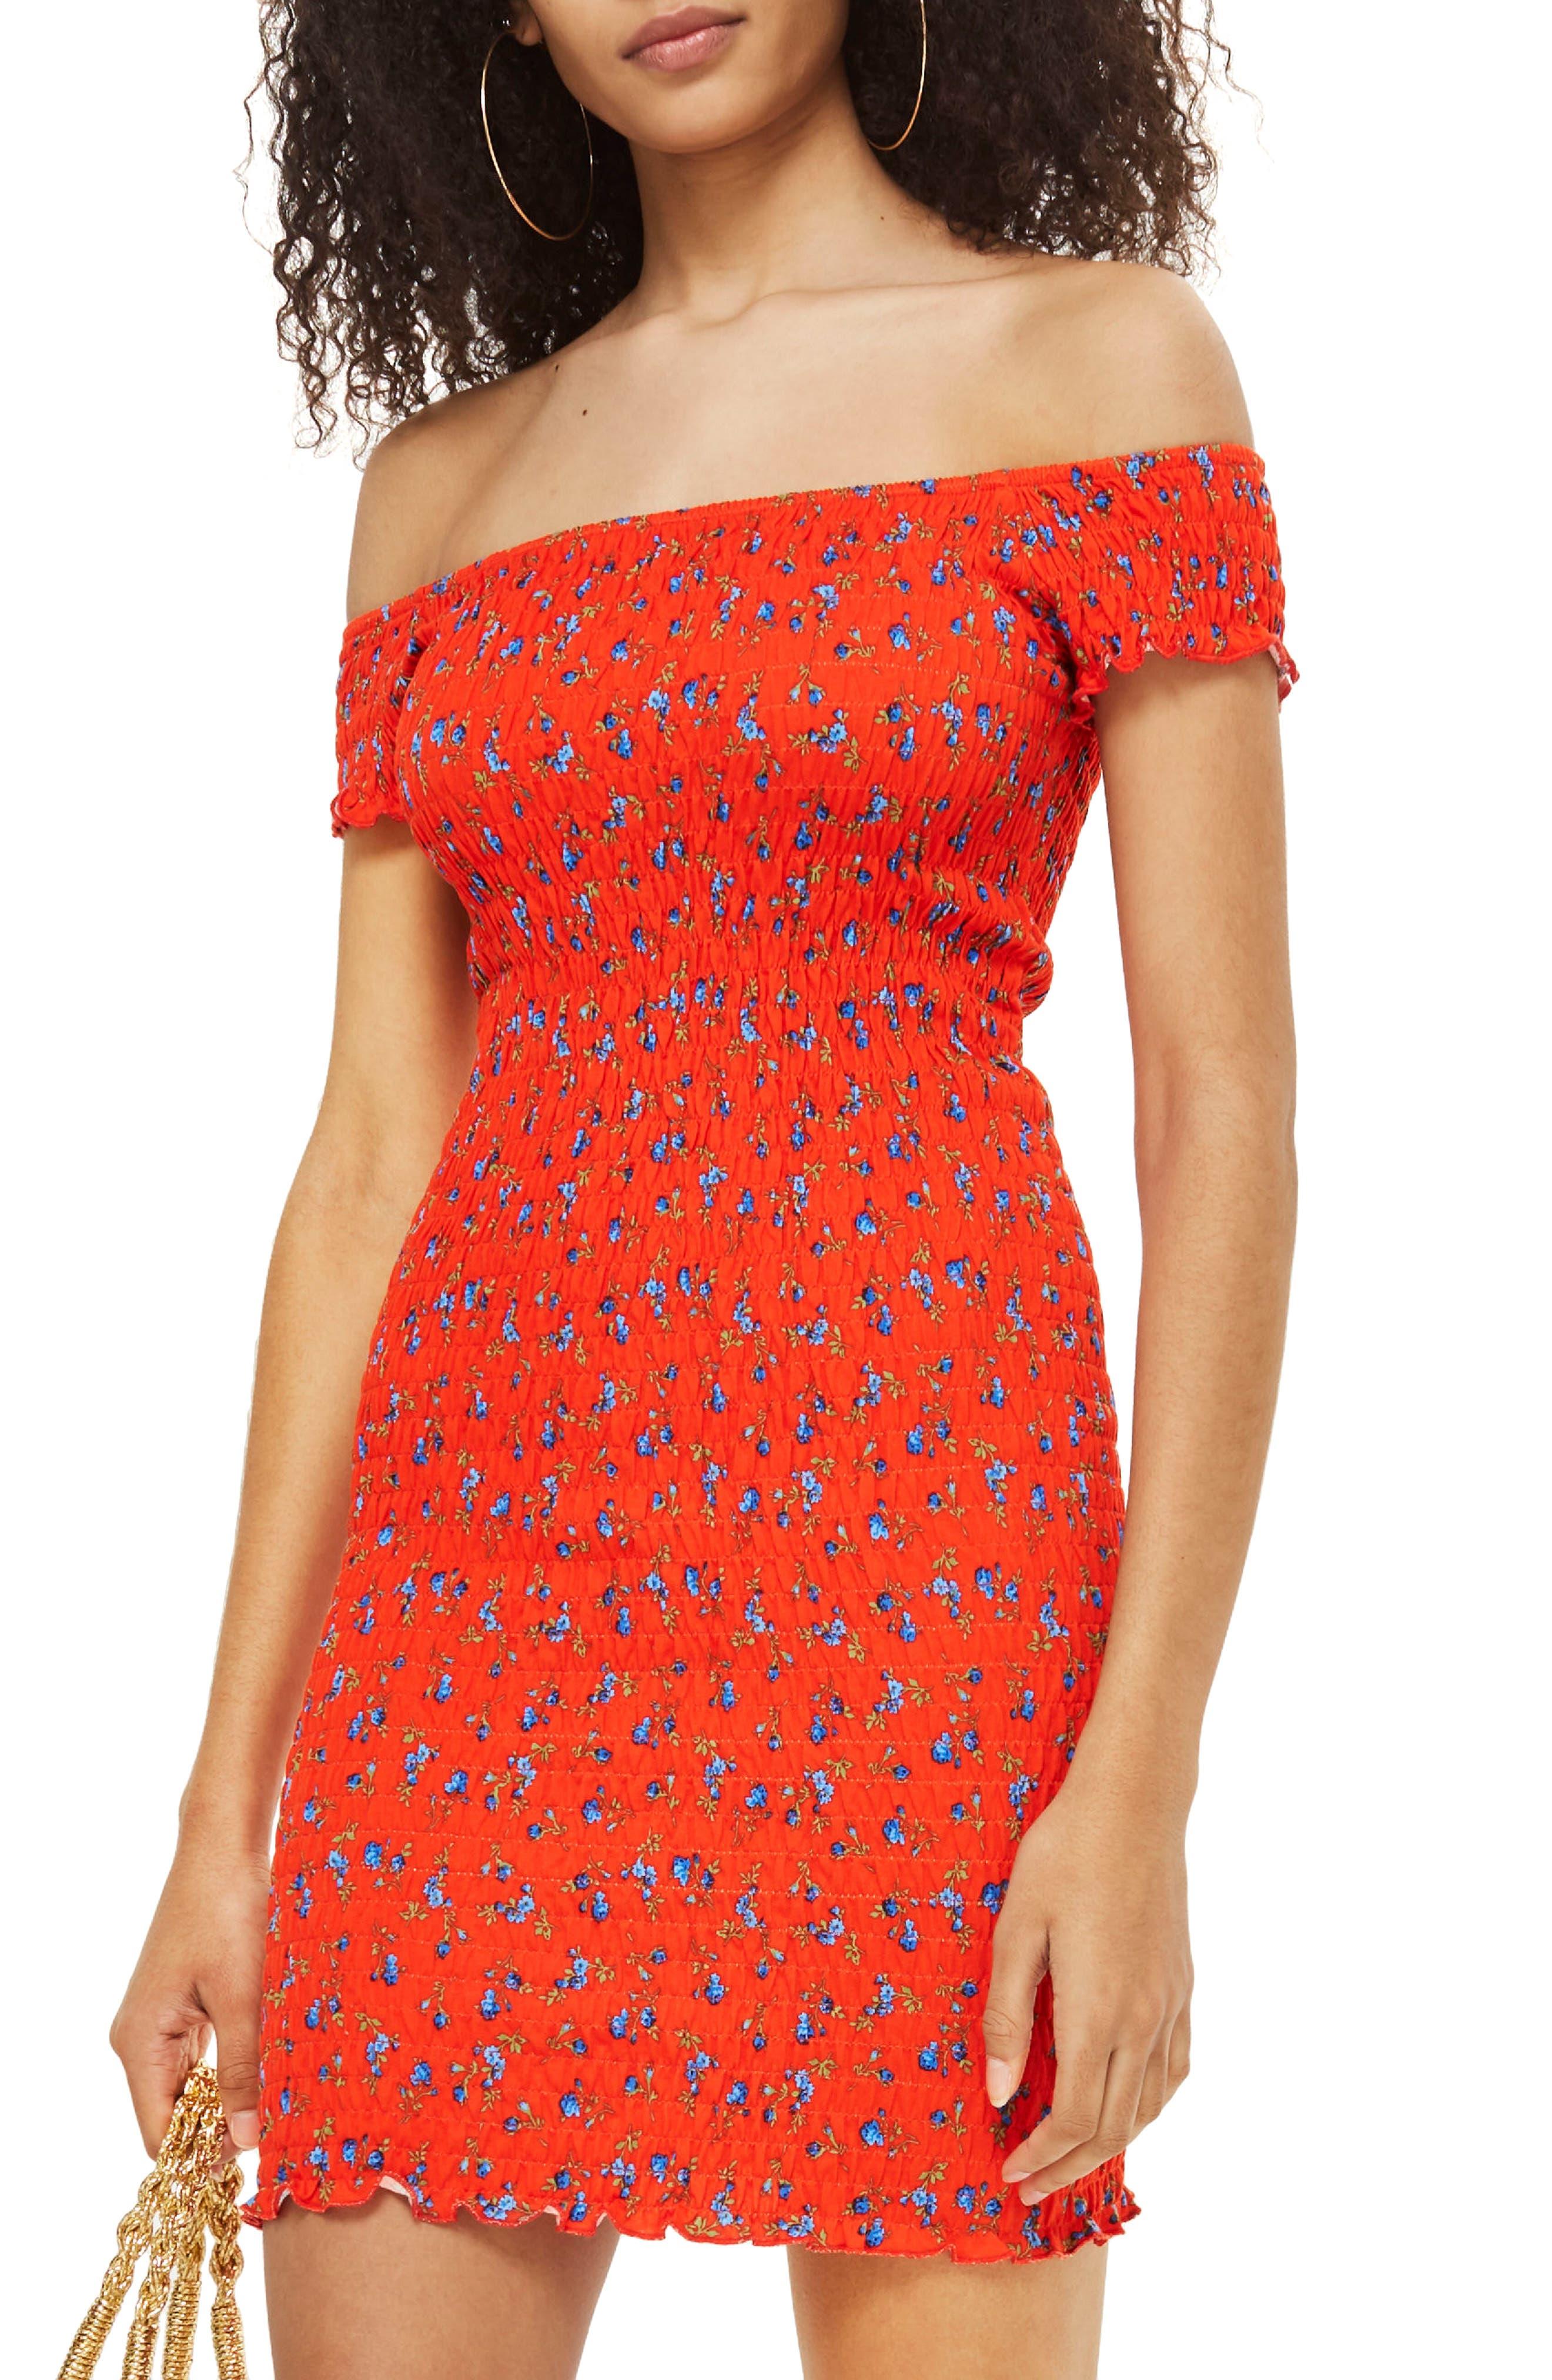 Topshop Smocked Ditsy Body-Con Dress